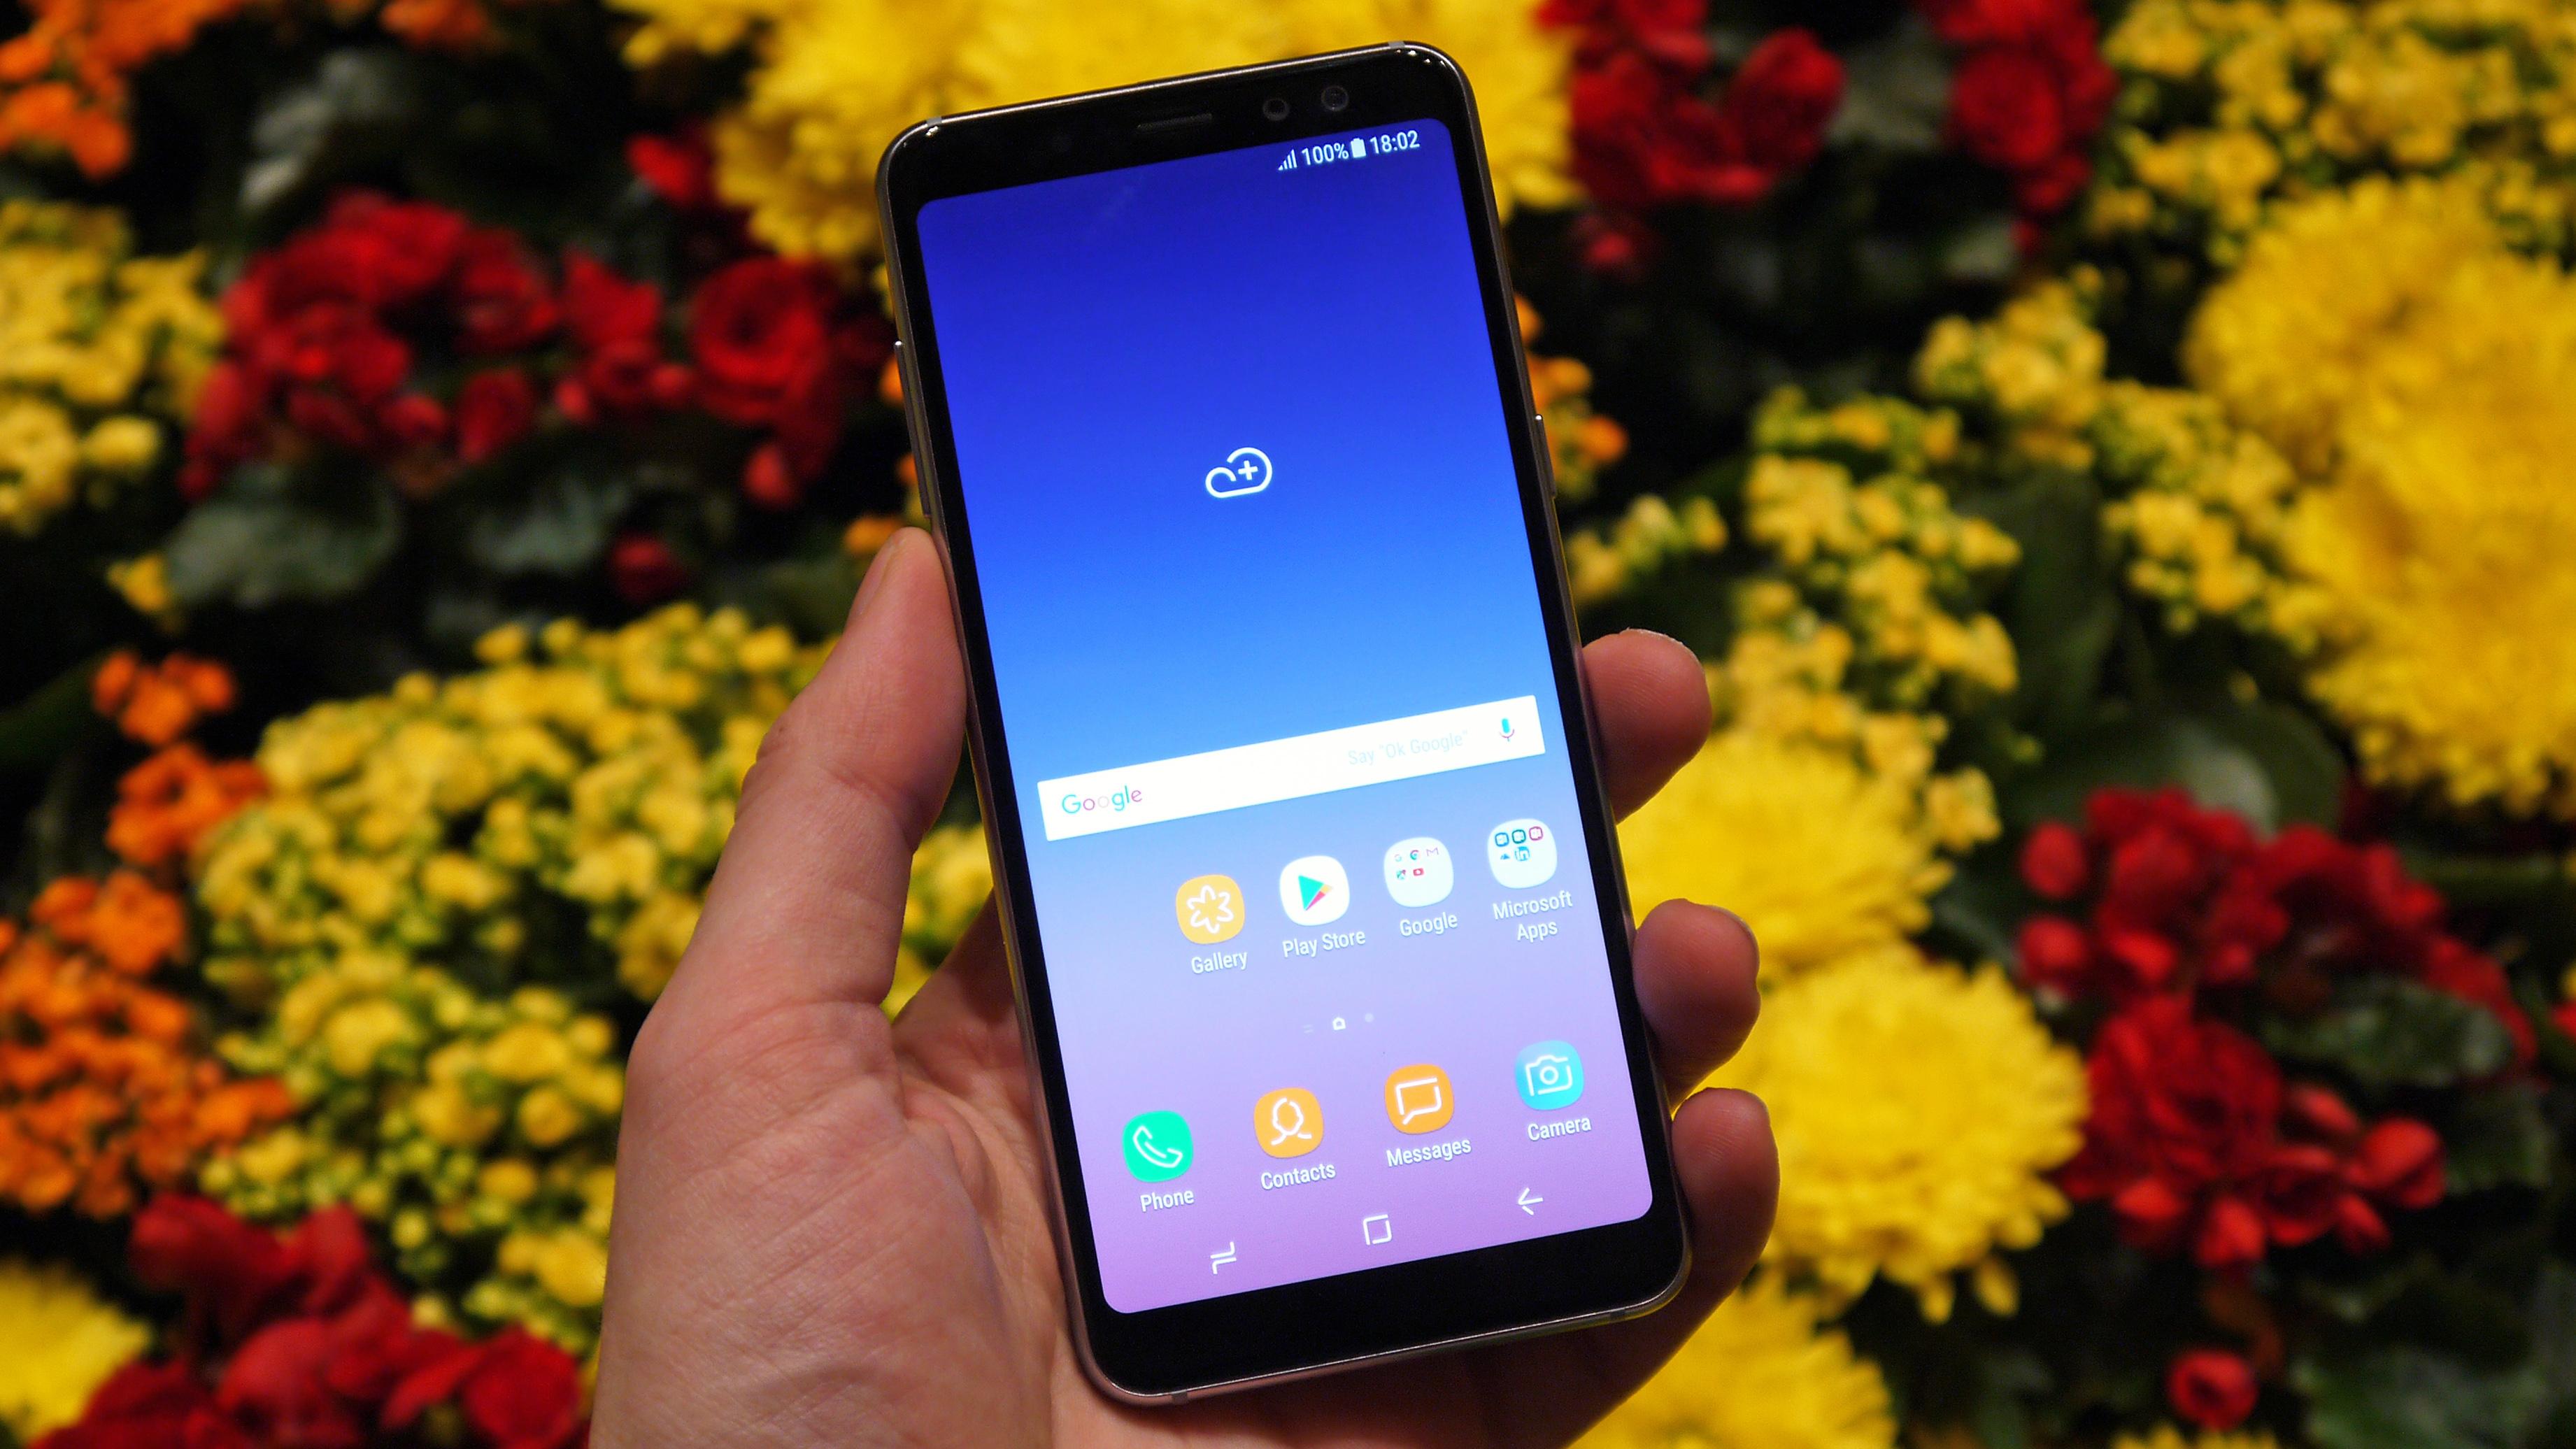 5QdmDyNXs9ocS2mXzBXo63 - Samsung's affordable, Infinity Display-toting Galaxy A8 has finally landed in Australia